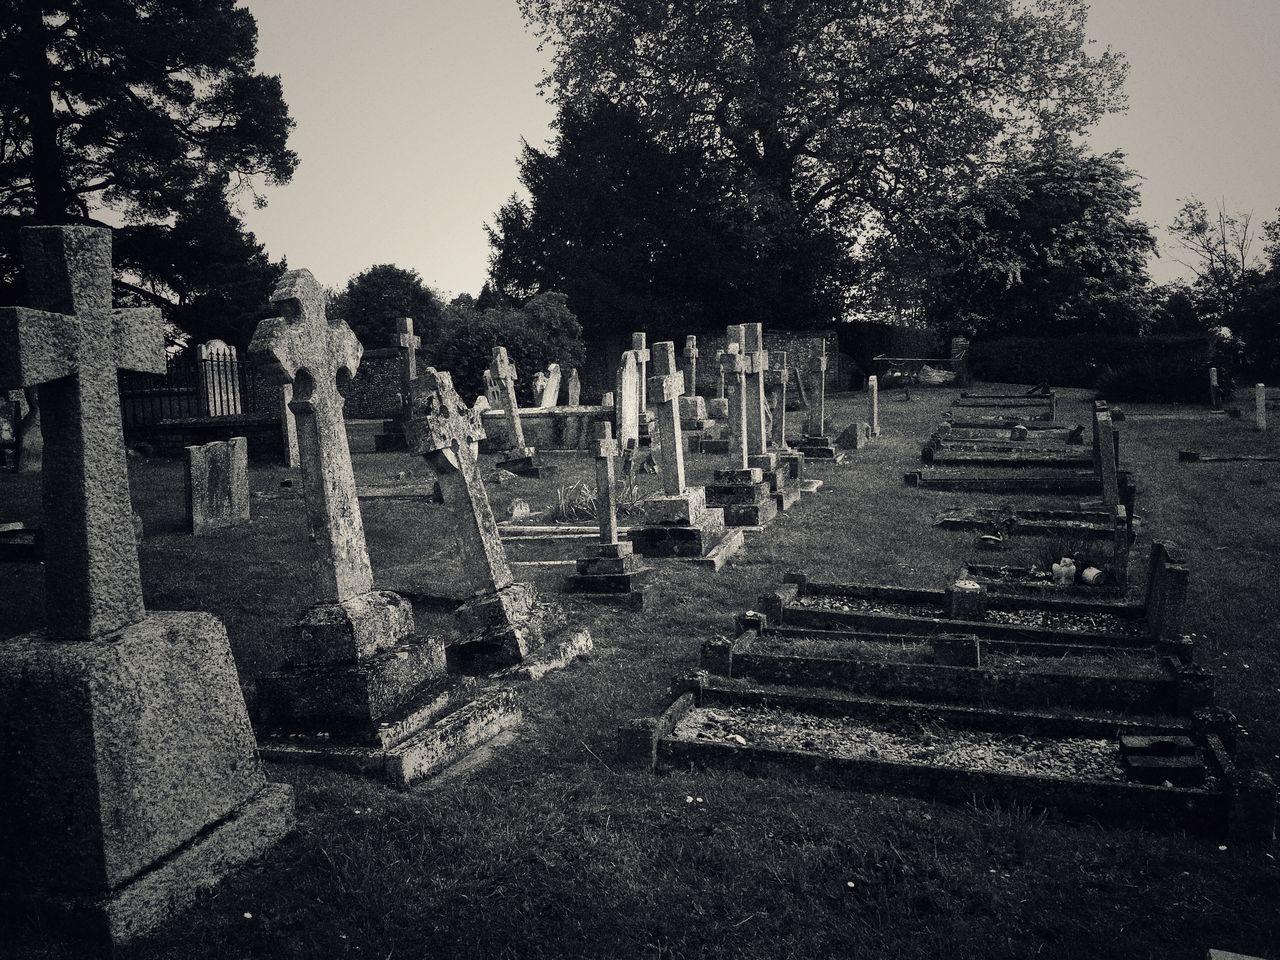 This is our local Graveyard Graveyard Beauty Headstone Flowers Churchyard EyeEm Best Shots EyeEm Gallery EyeEm Best Edits Peace Architecture Monochrome Blackandwhite Blackandwhite Photography